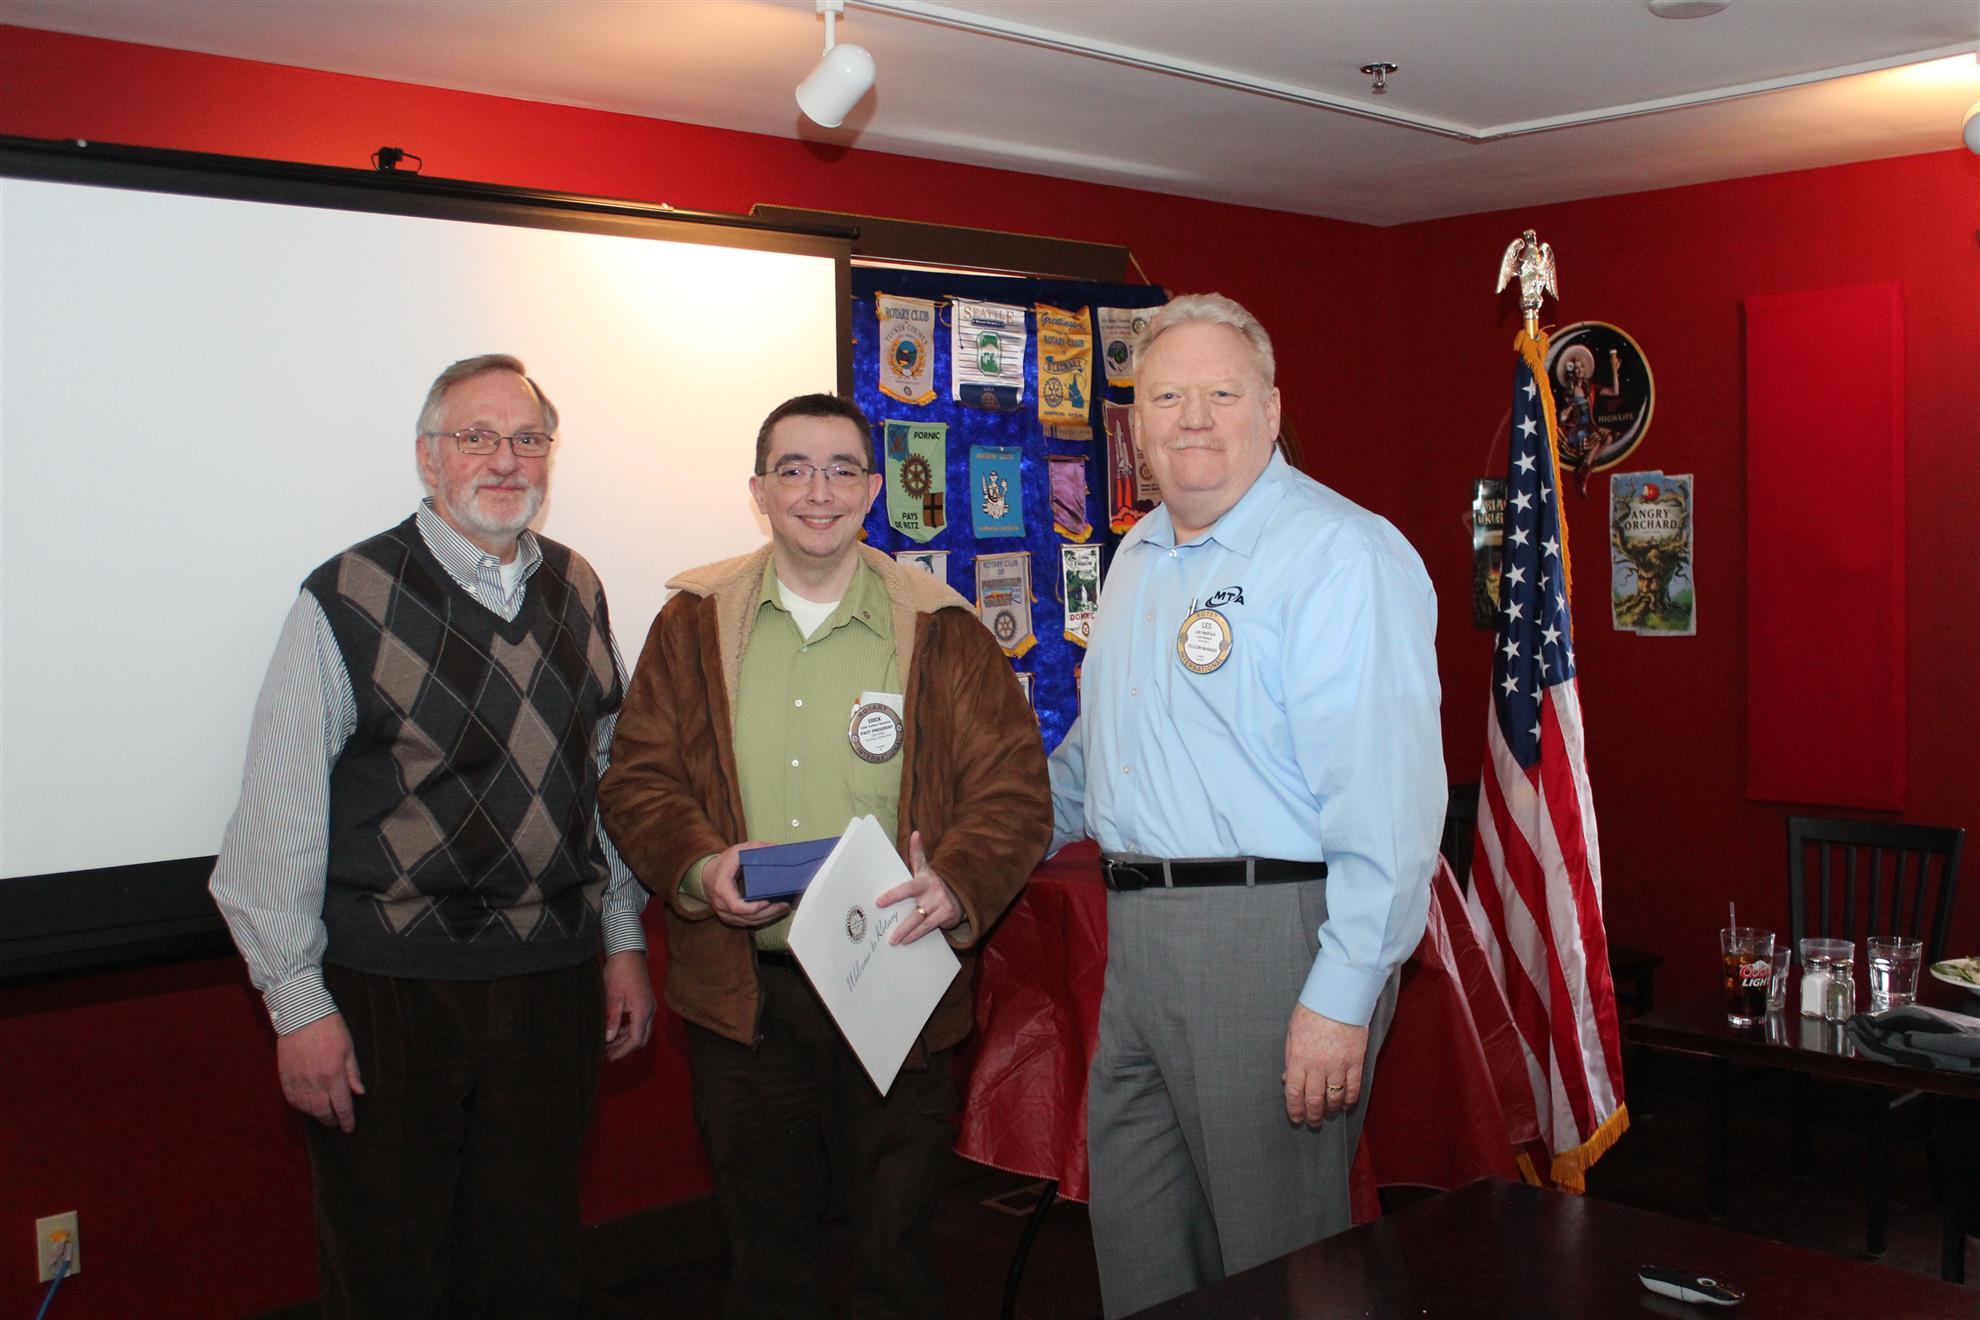 February 12th 2015 Rotary Club Of Palmer